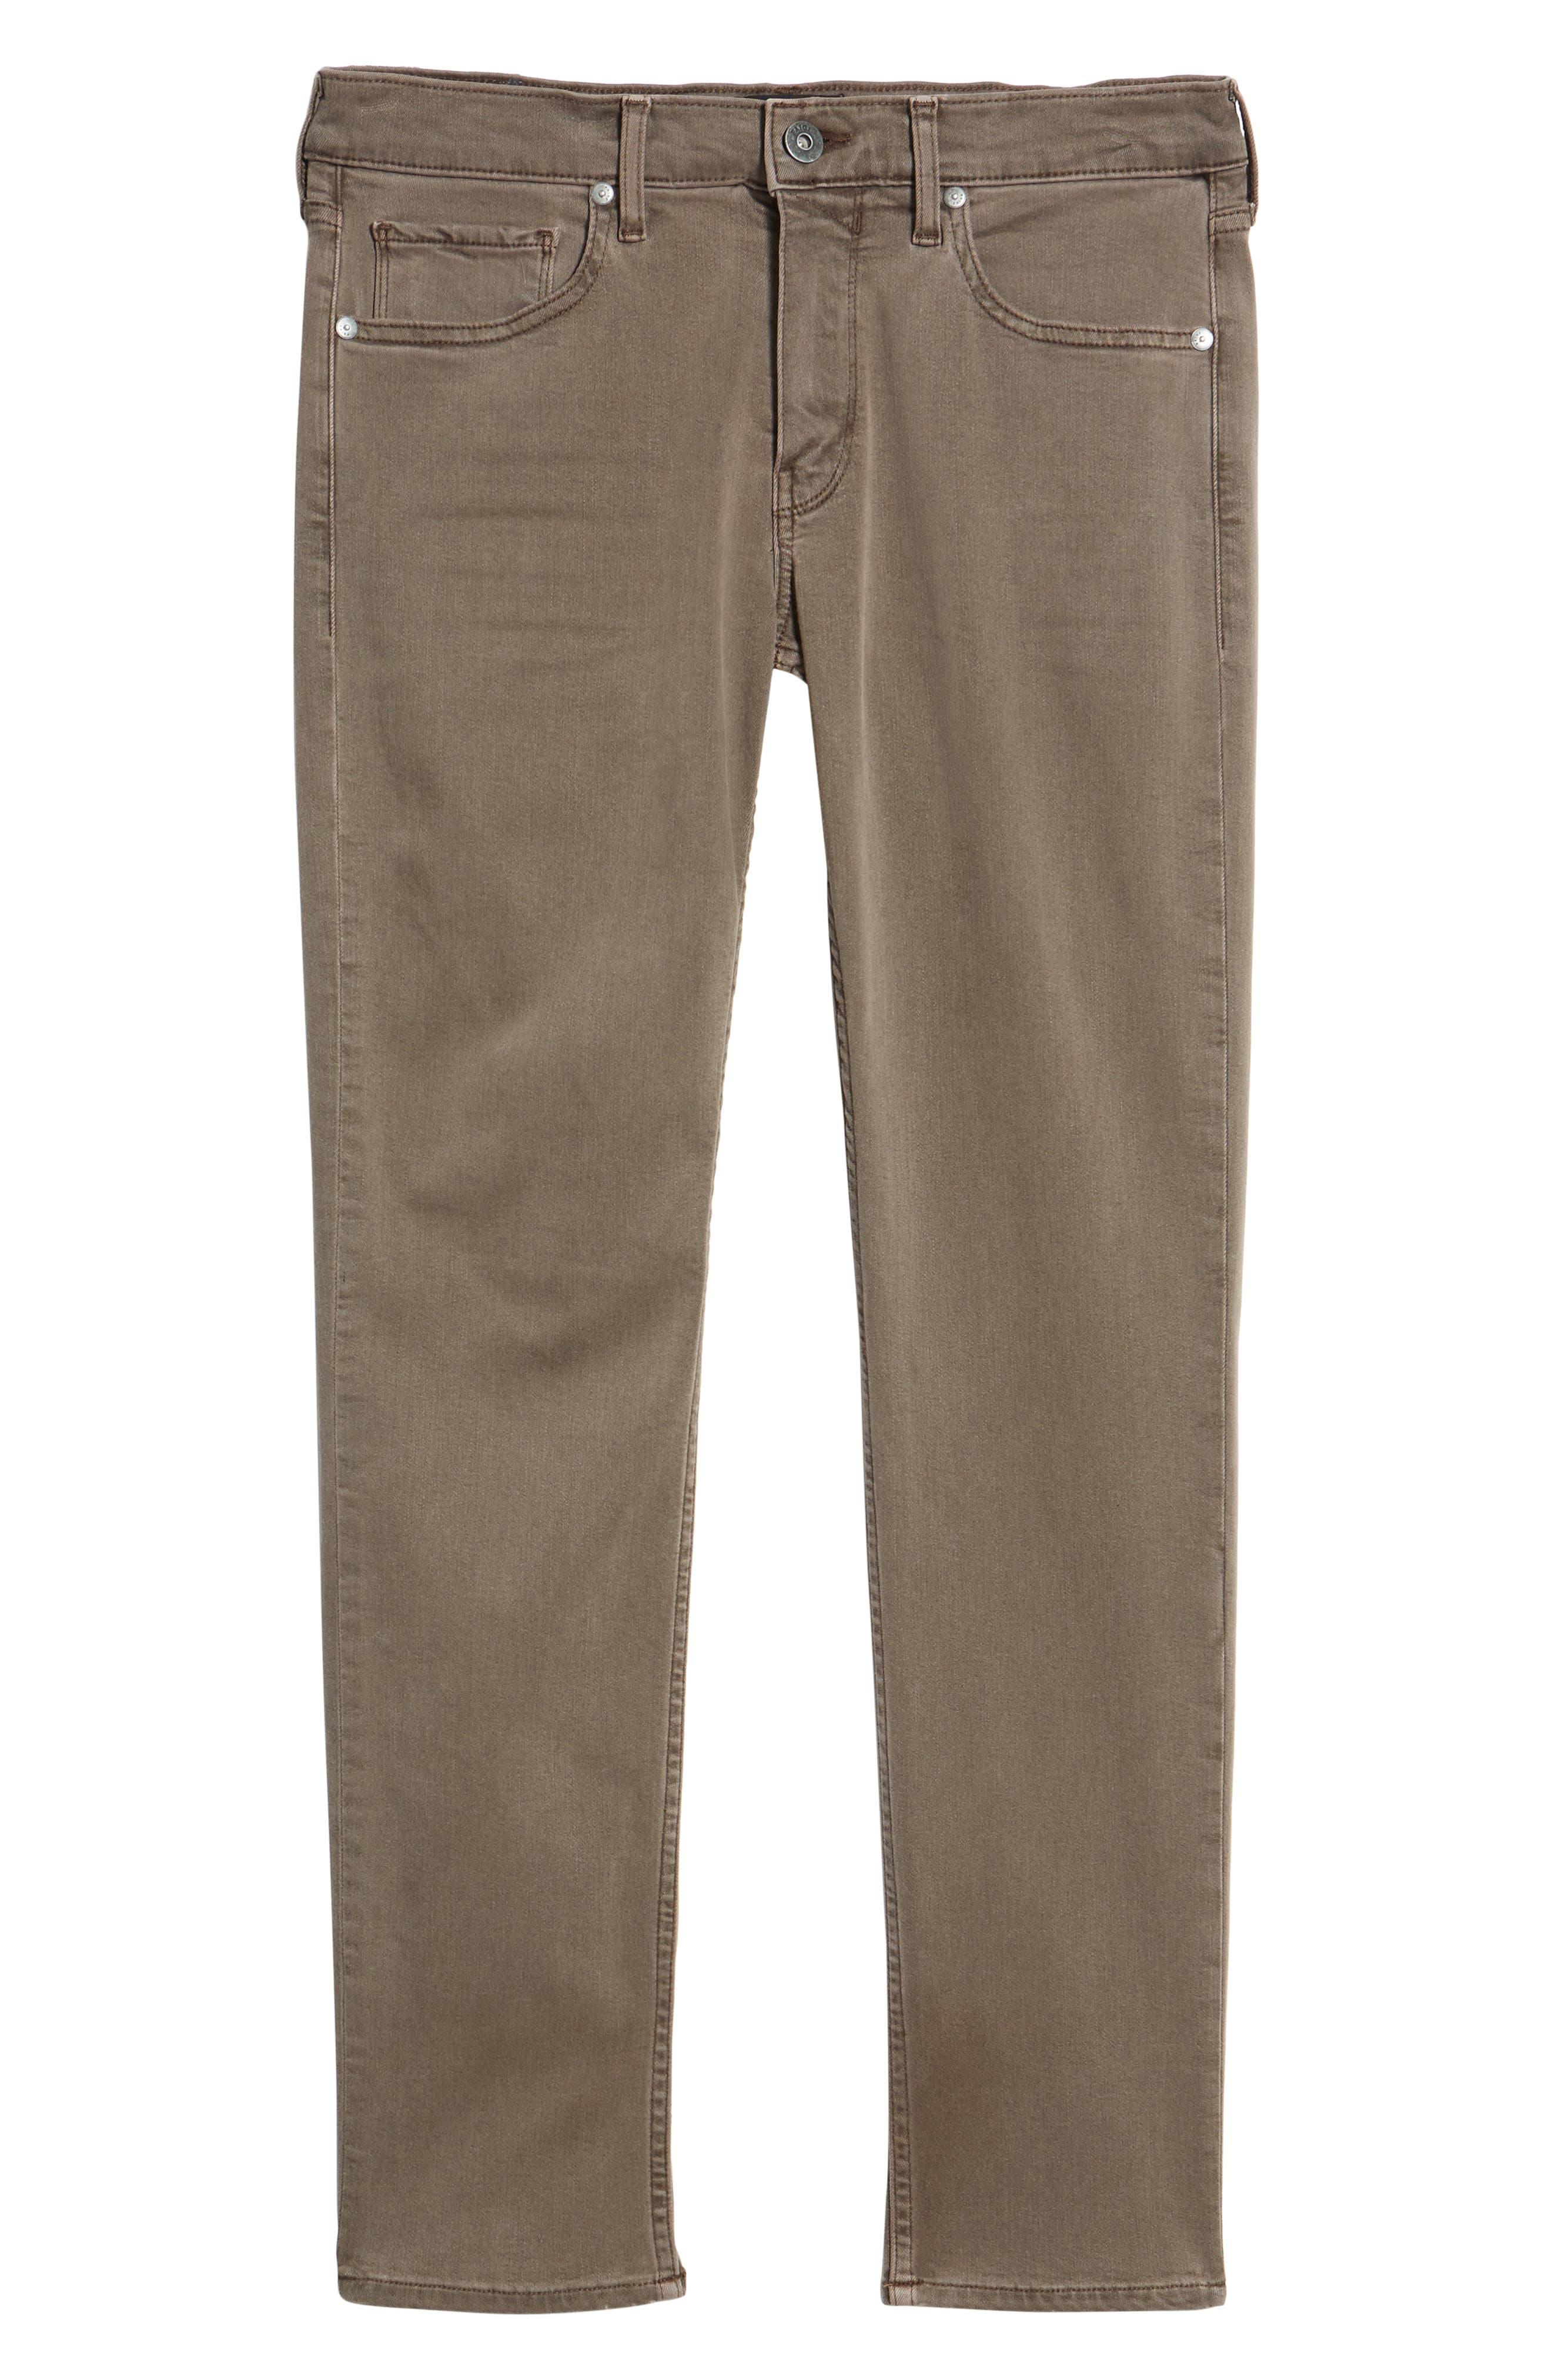 Transcend - Lennox Slim Fit Jeans,                             Alternate thumbnail 6, color,                             VINTAGE SAND BAR